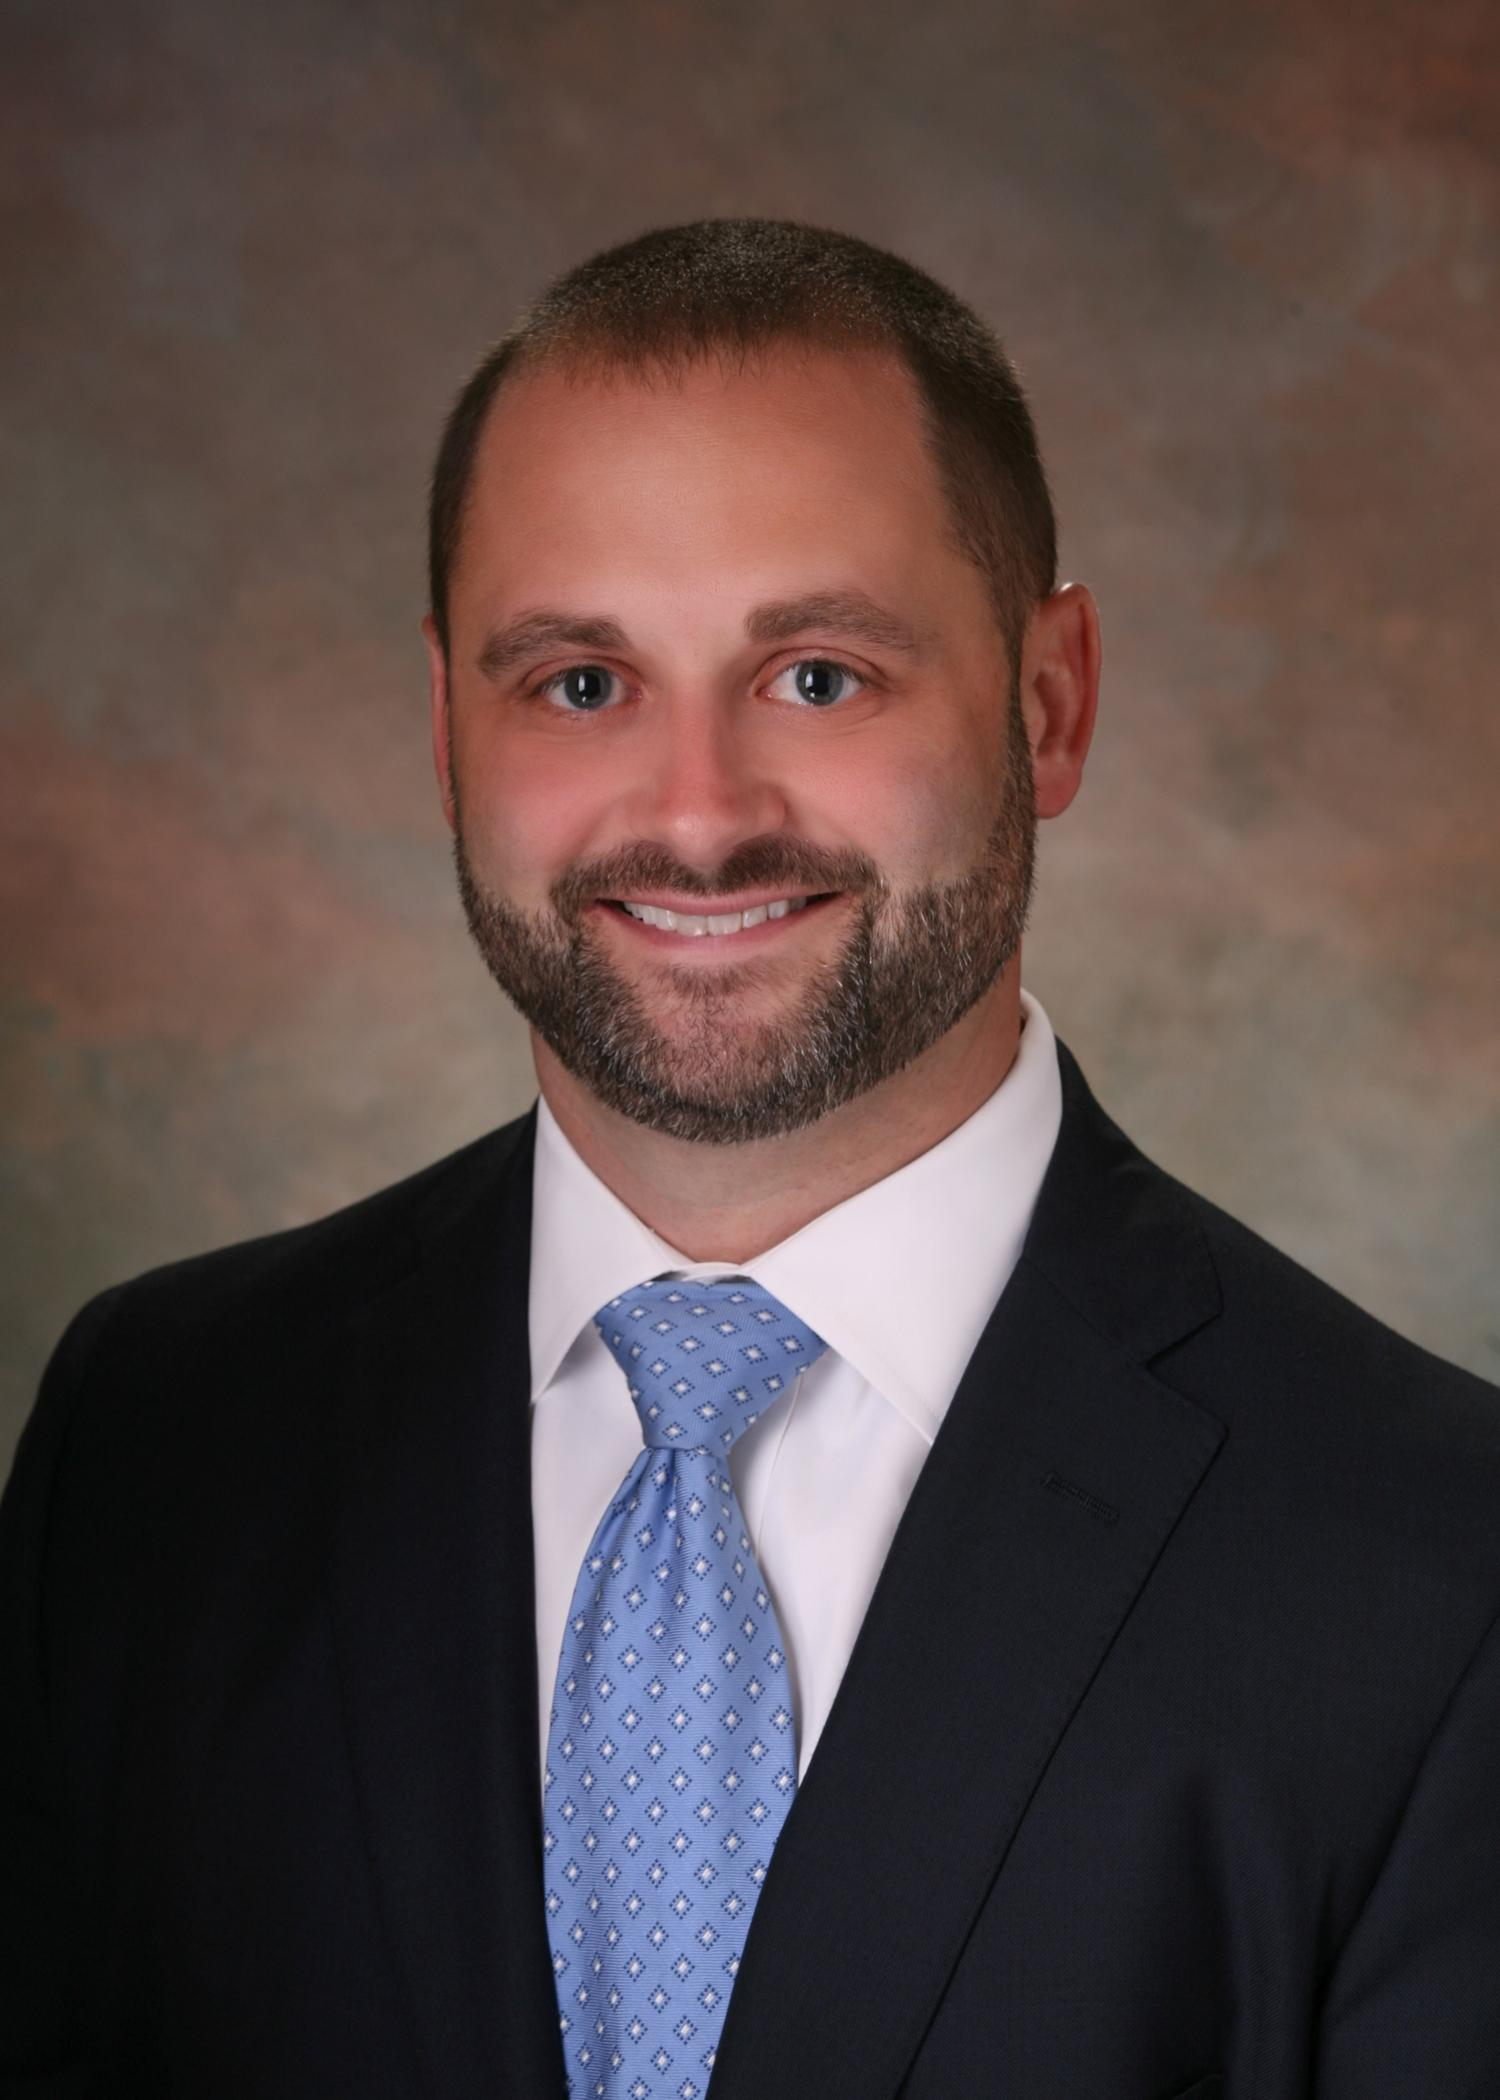 GREGORY S. SHELTON Your Financial Advisor